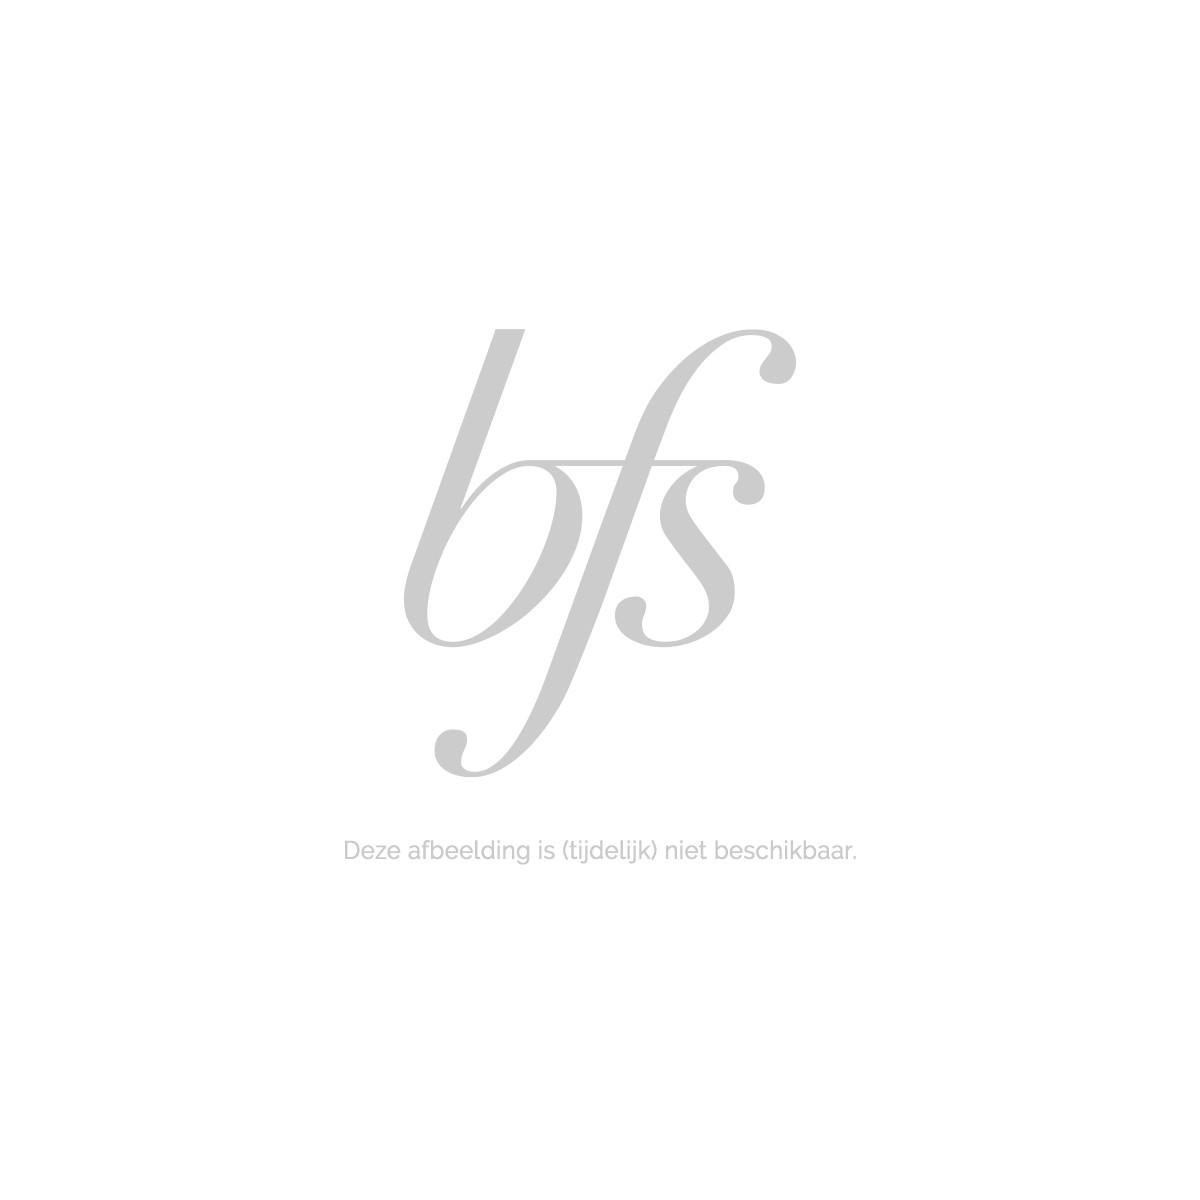 Orly Breathable 18 Ml | Günstig Hautpflege Kaufen